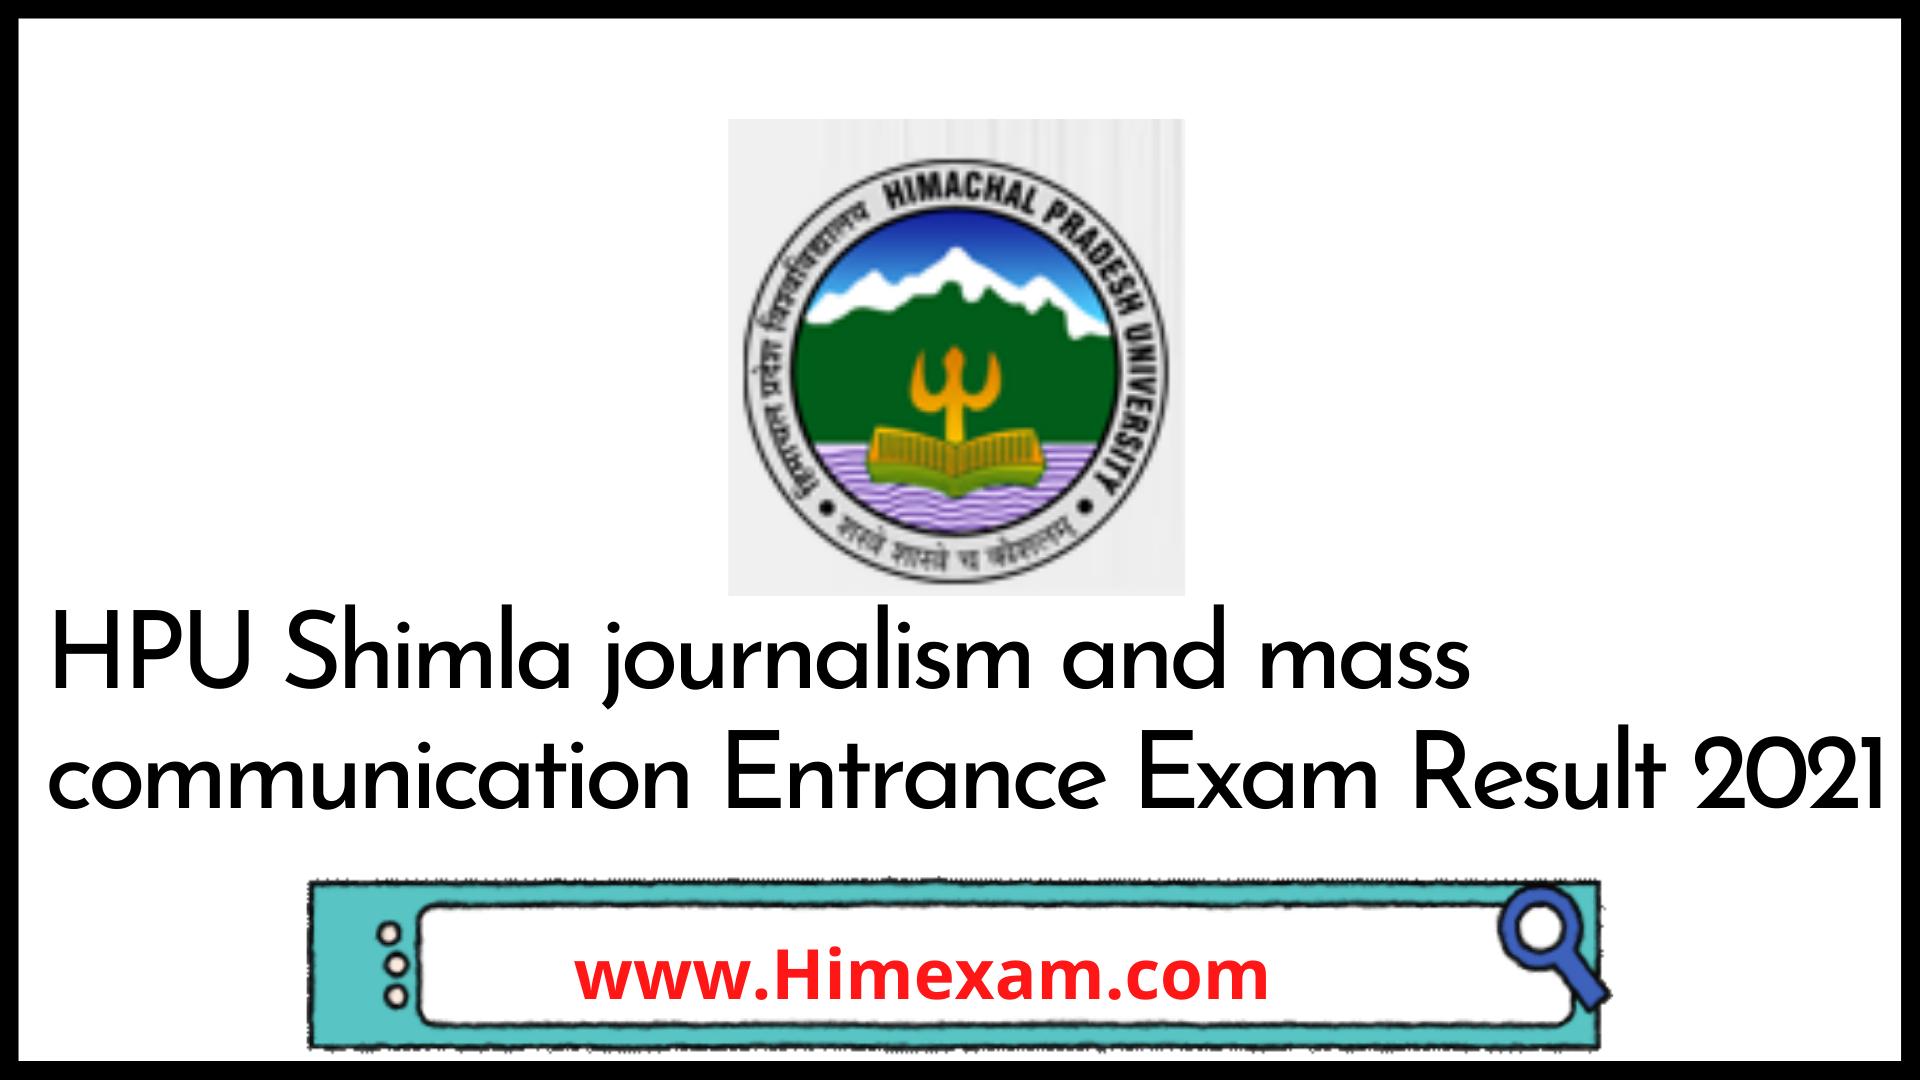 HPU Shimla journalism and mass communication Entrance Exam Result 2021